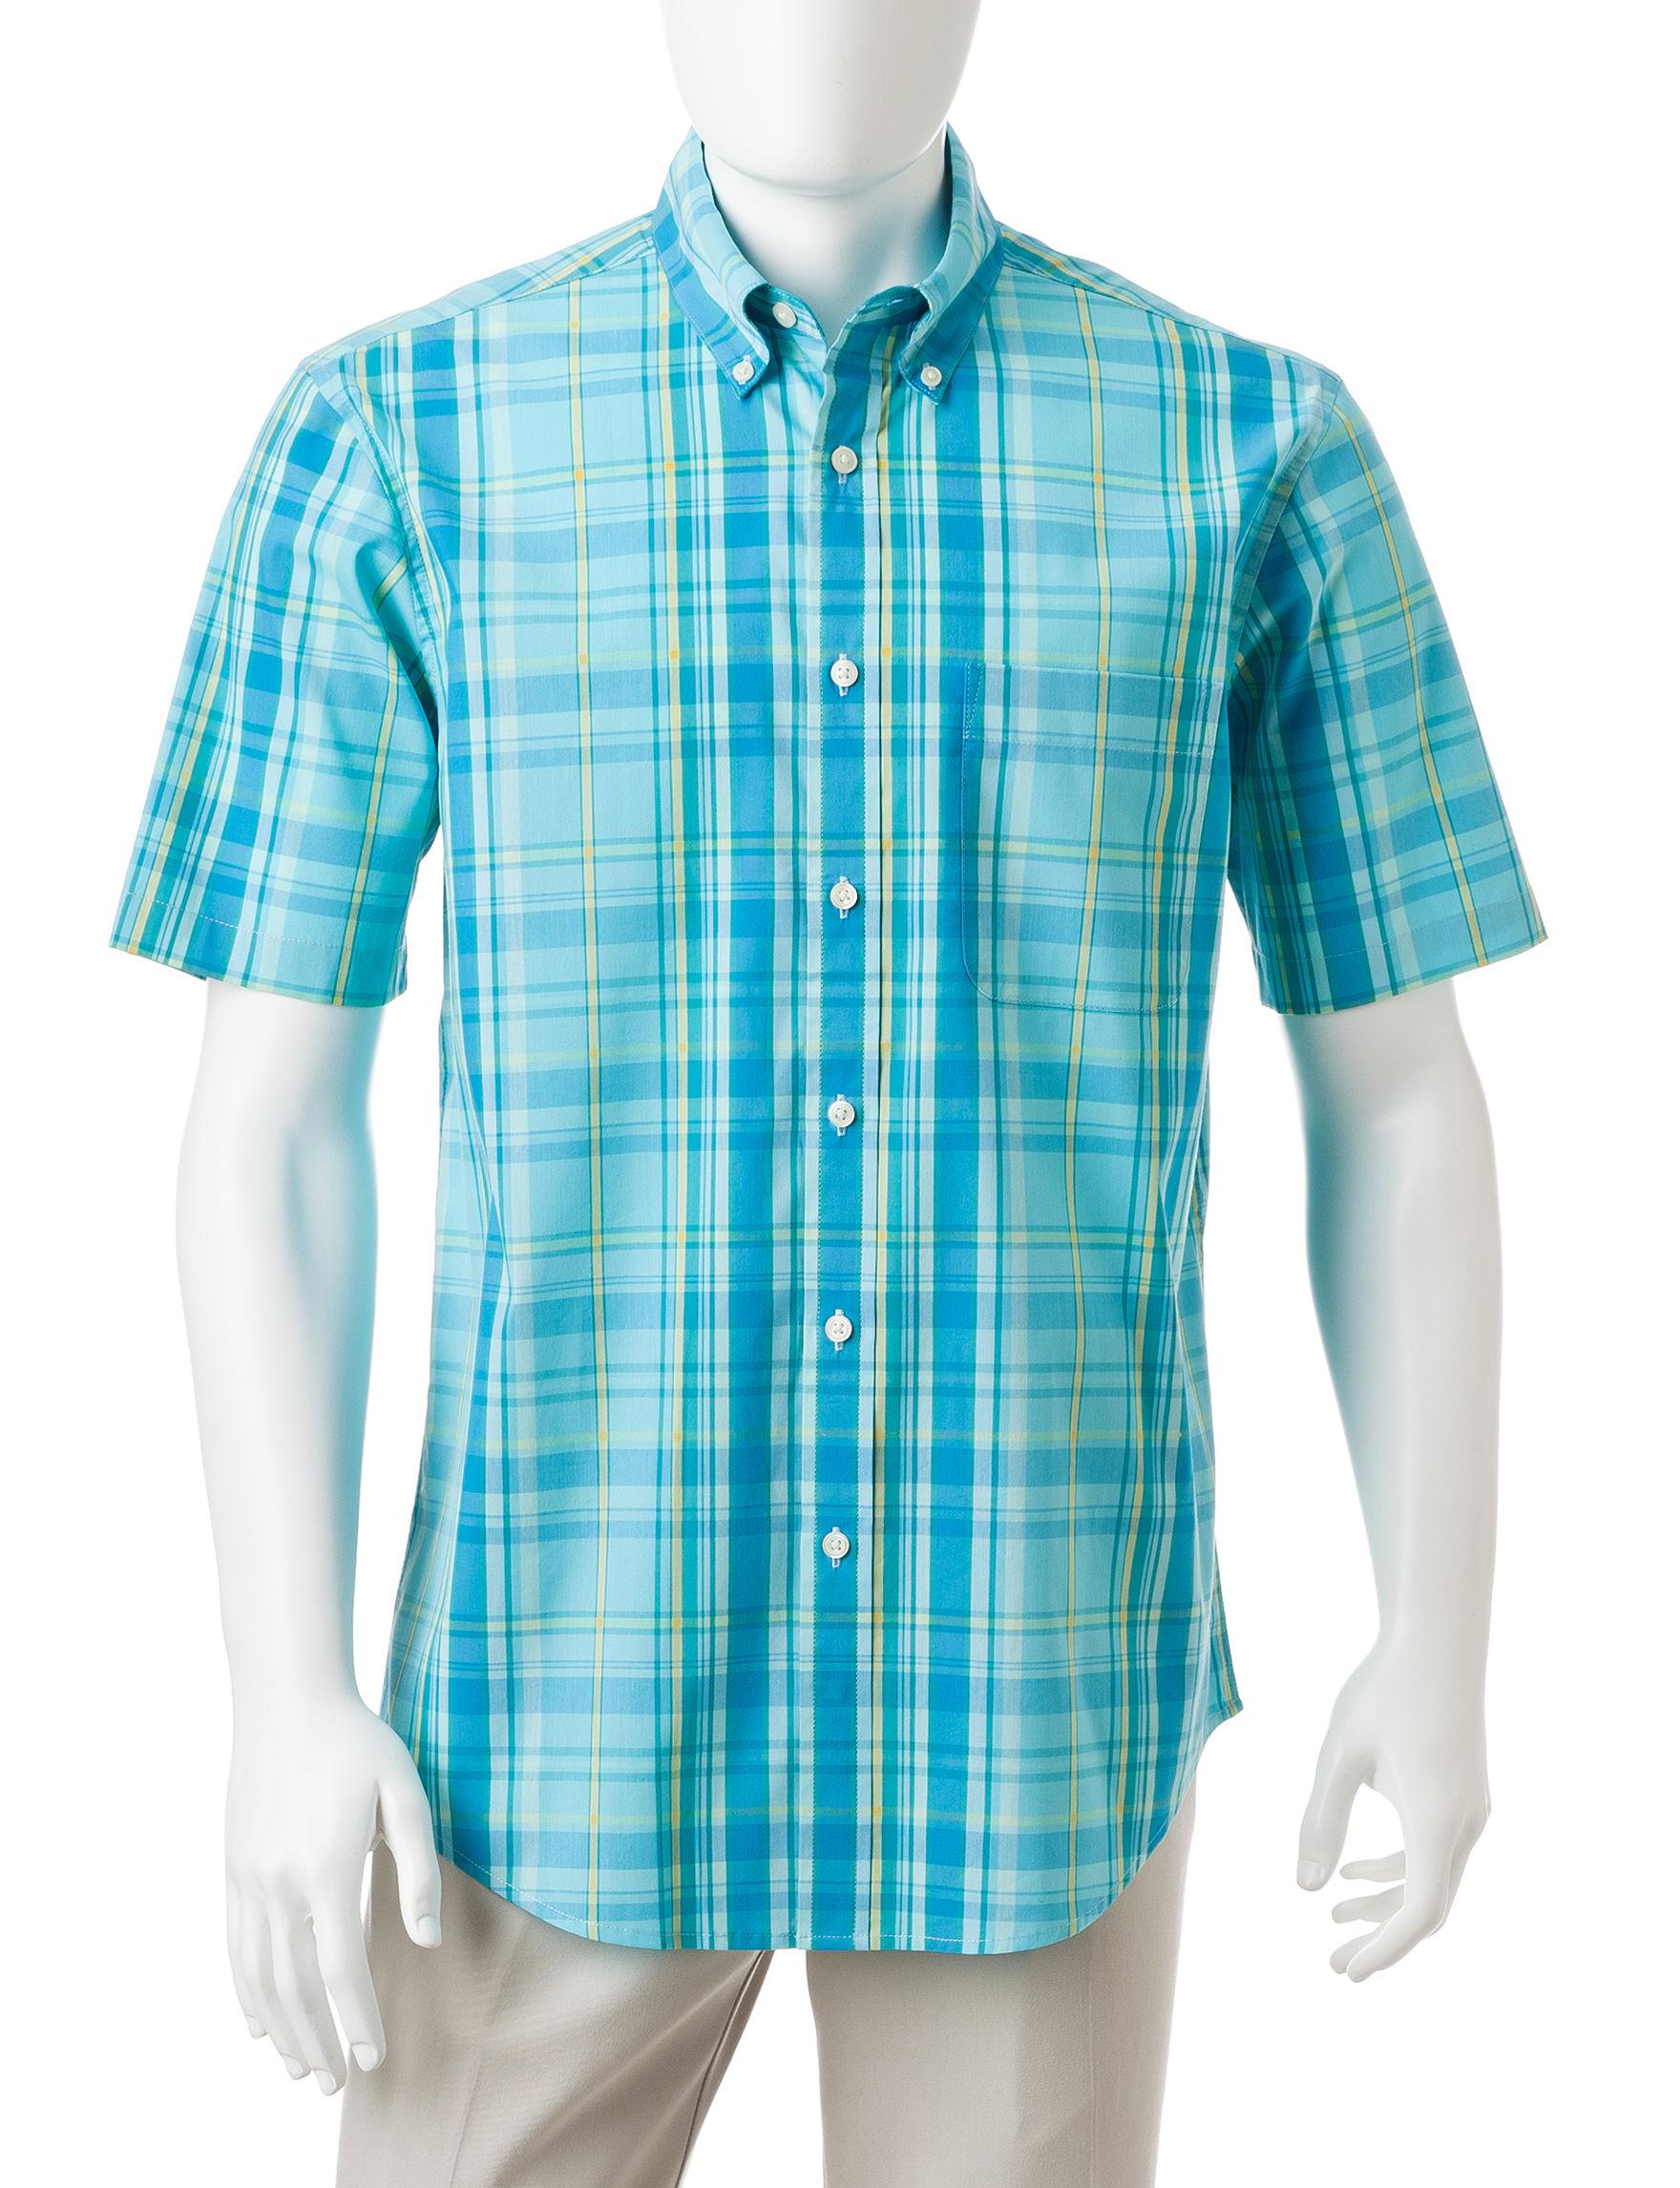 Sun River Seaglass Casual Button Down Shirts